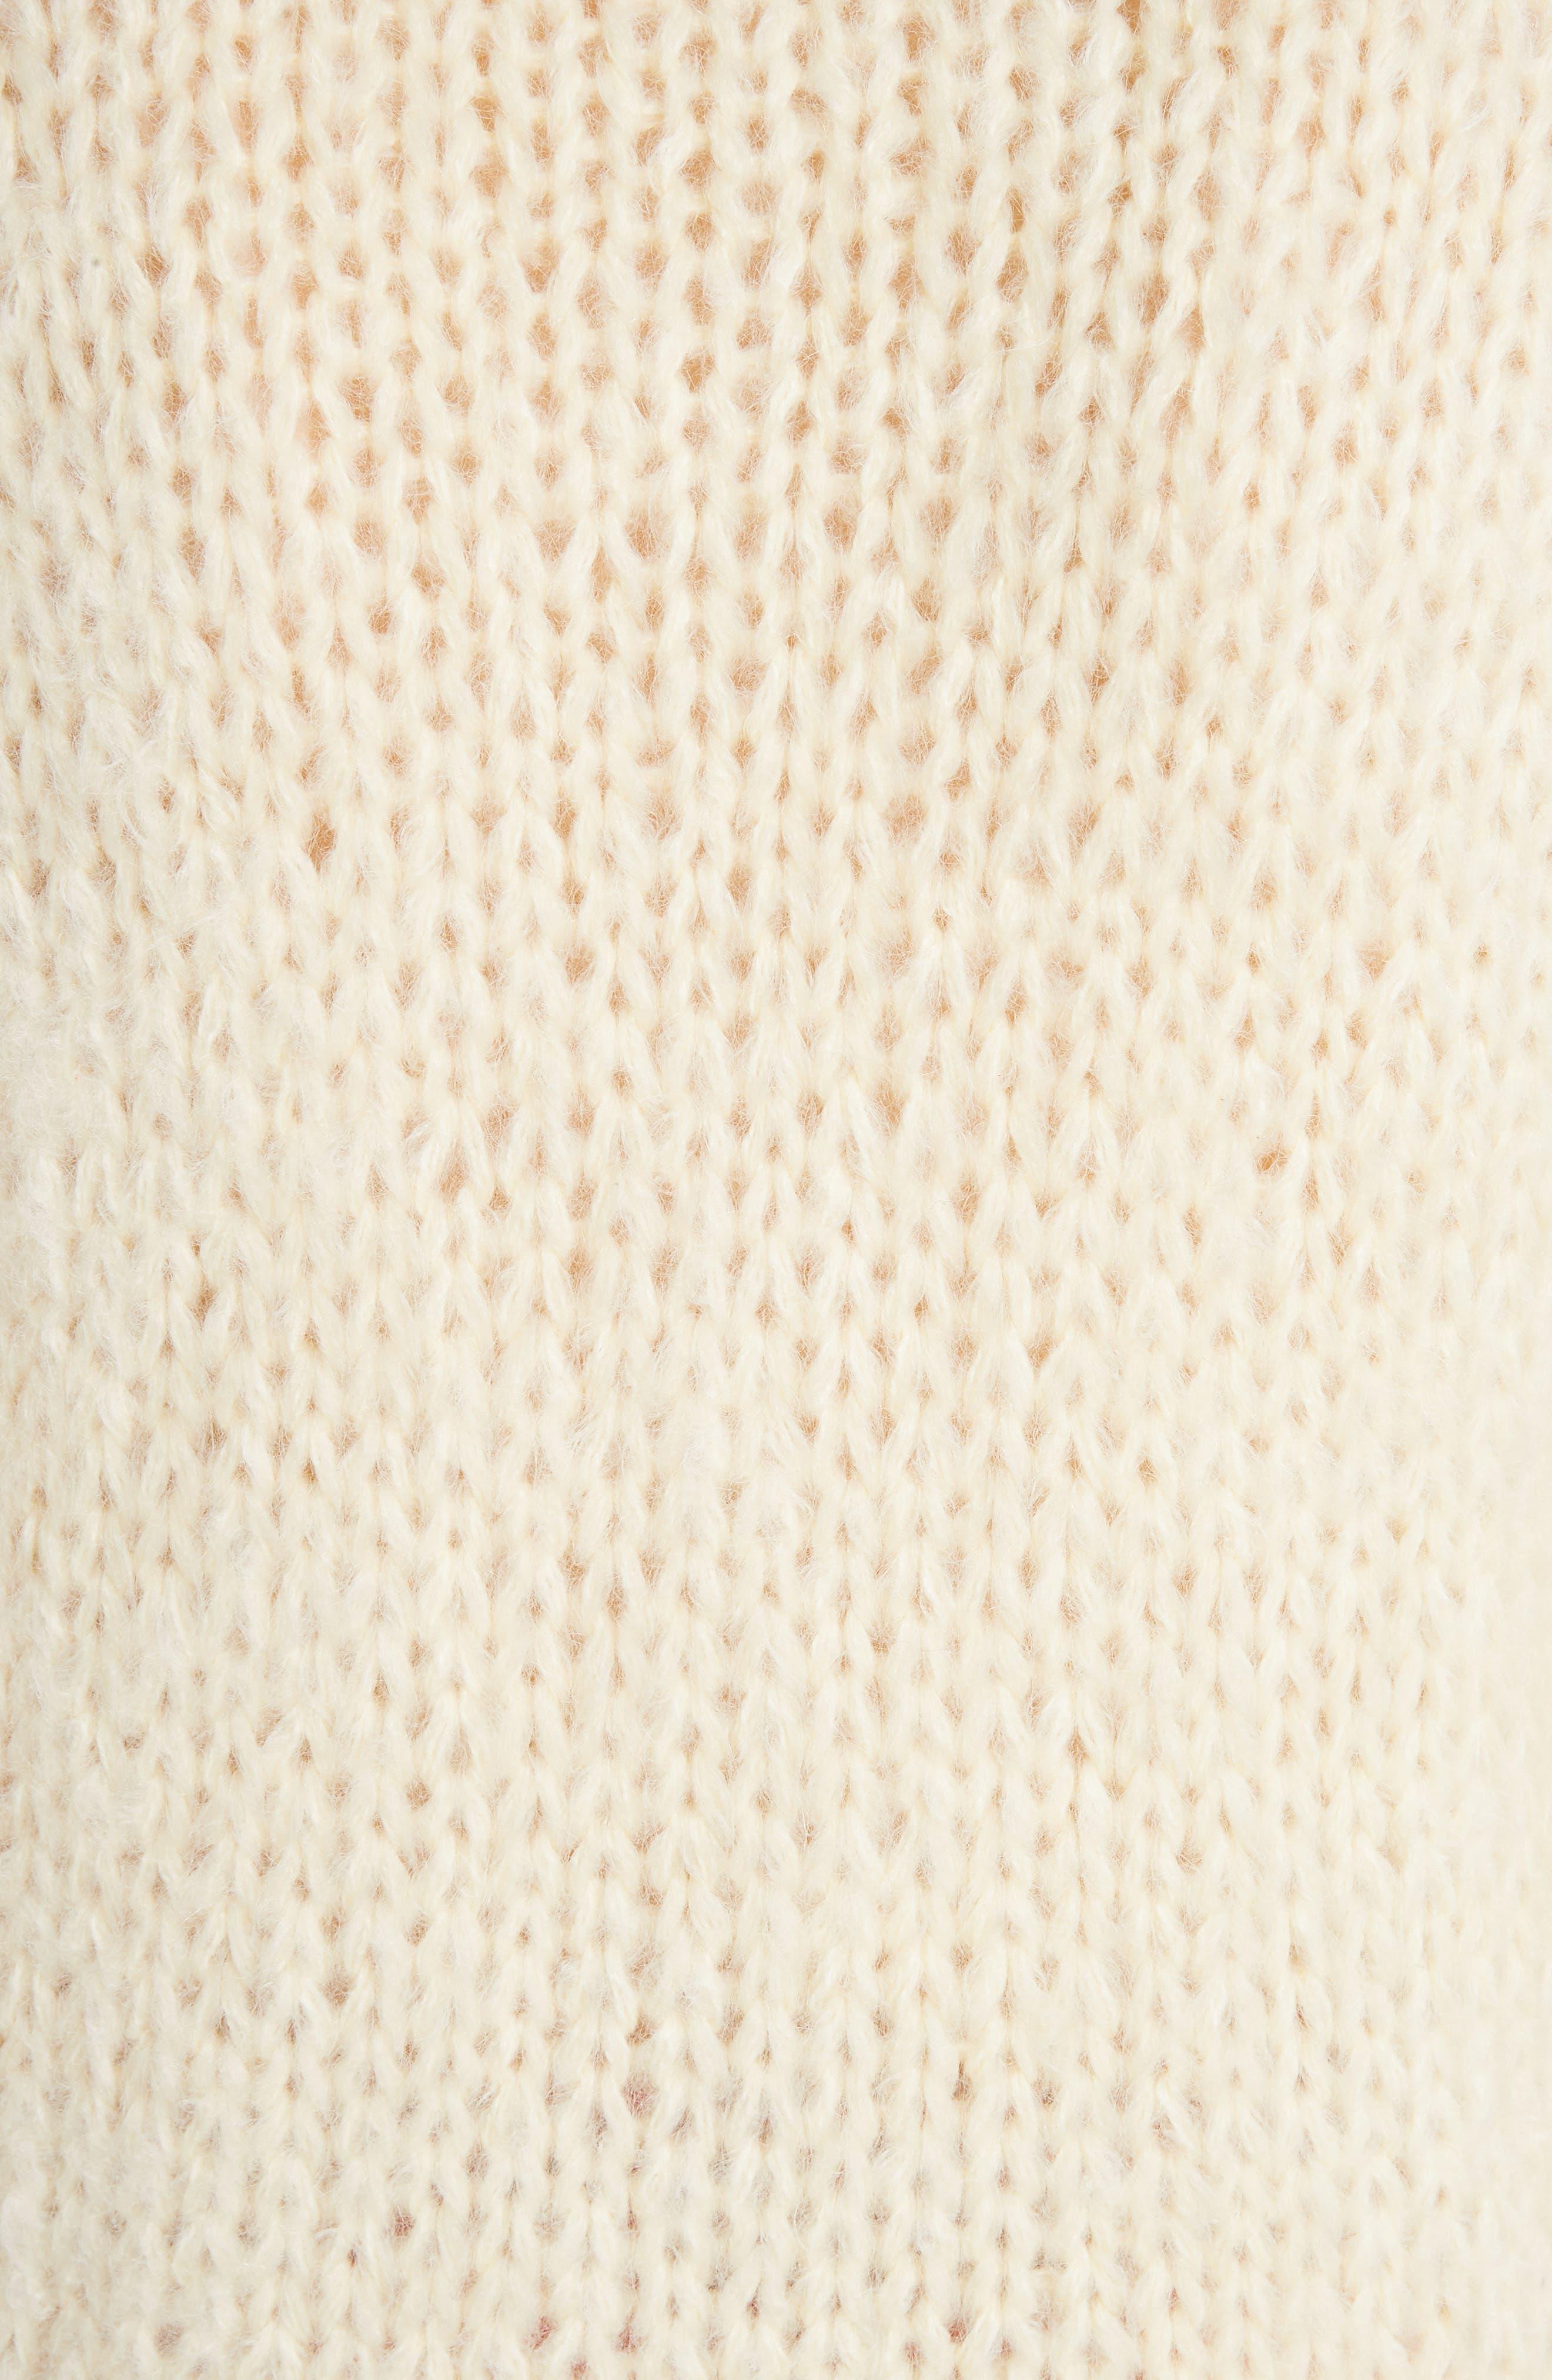 Juilliard Mohair & Wool Puff Sleeve Sweater,                             Alternate thumbnail 5, color,                             900